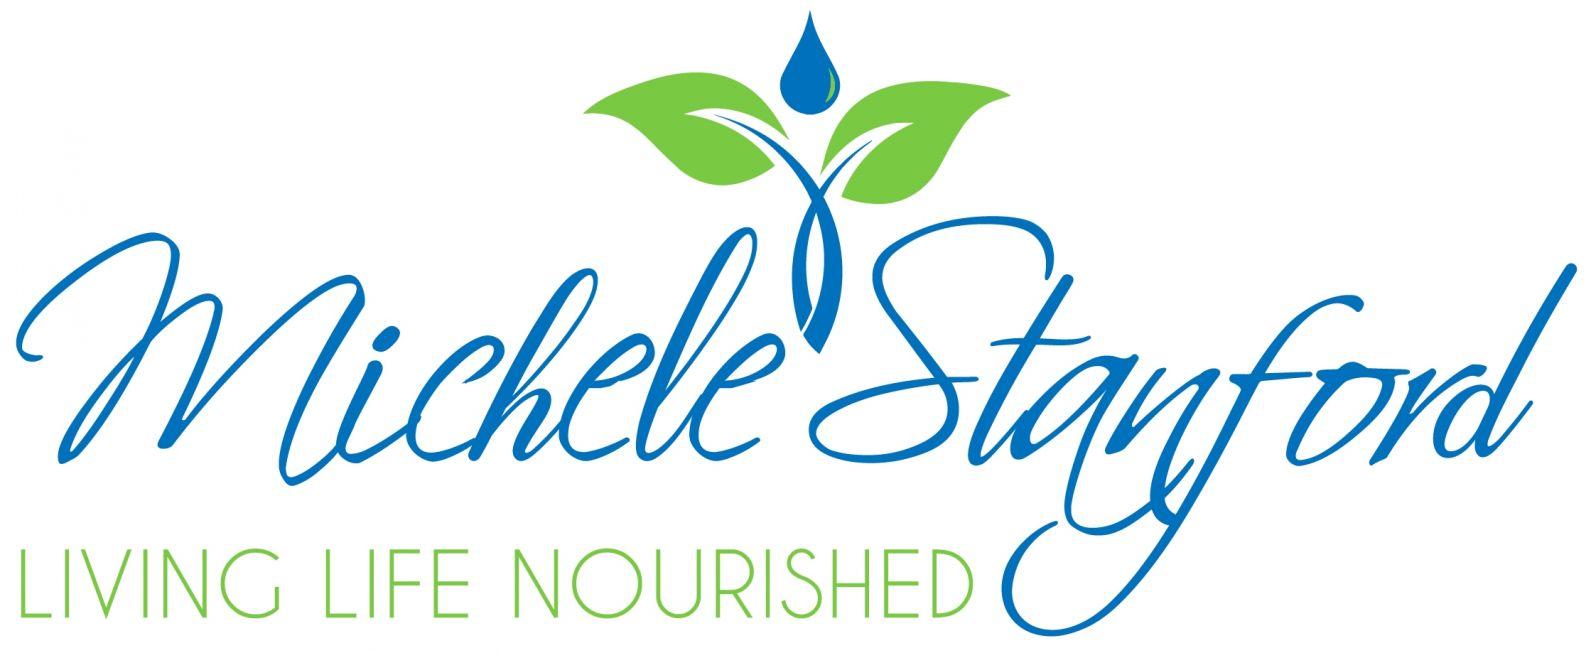 MicheleStanford Logo